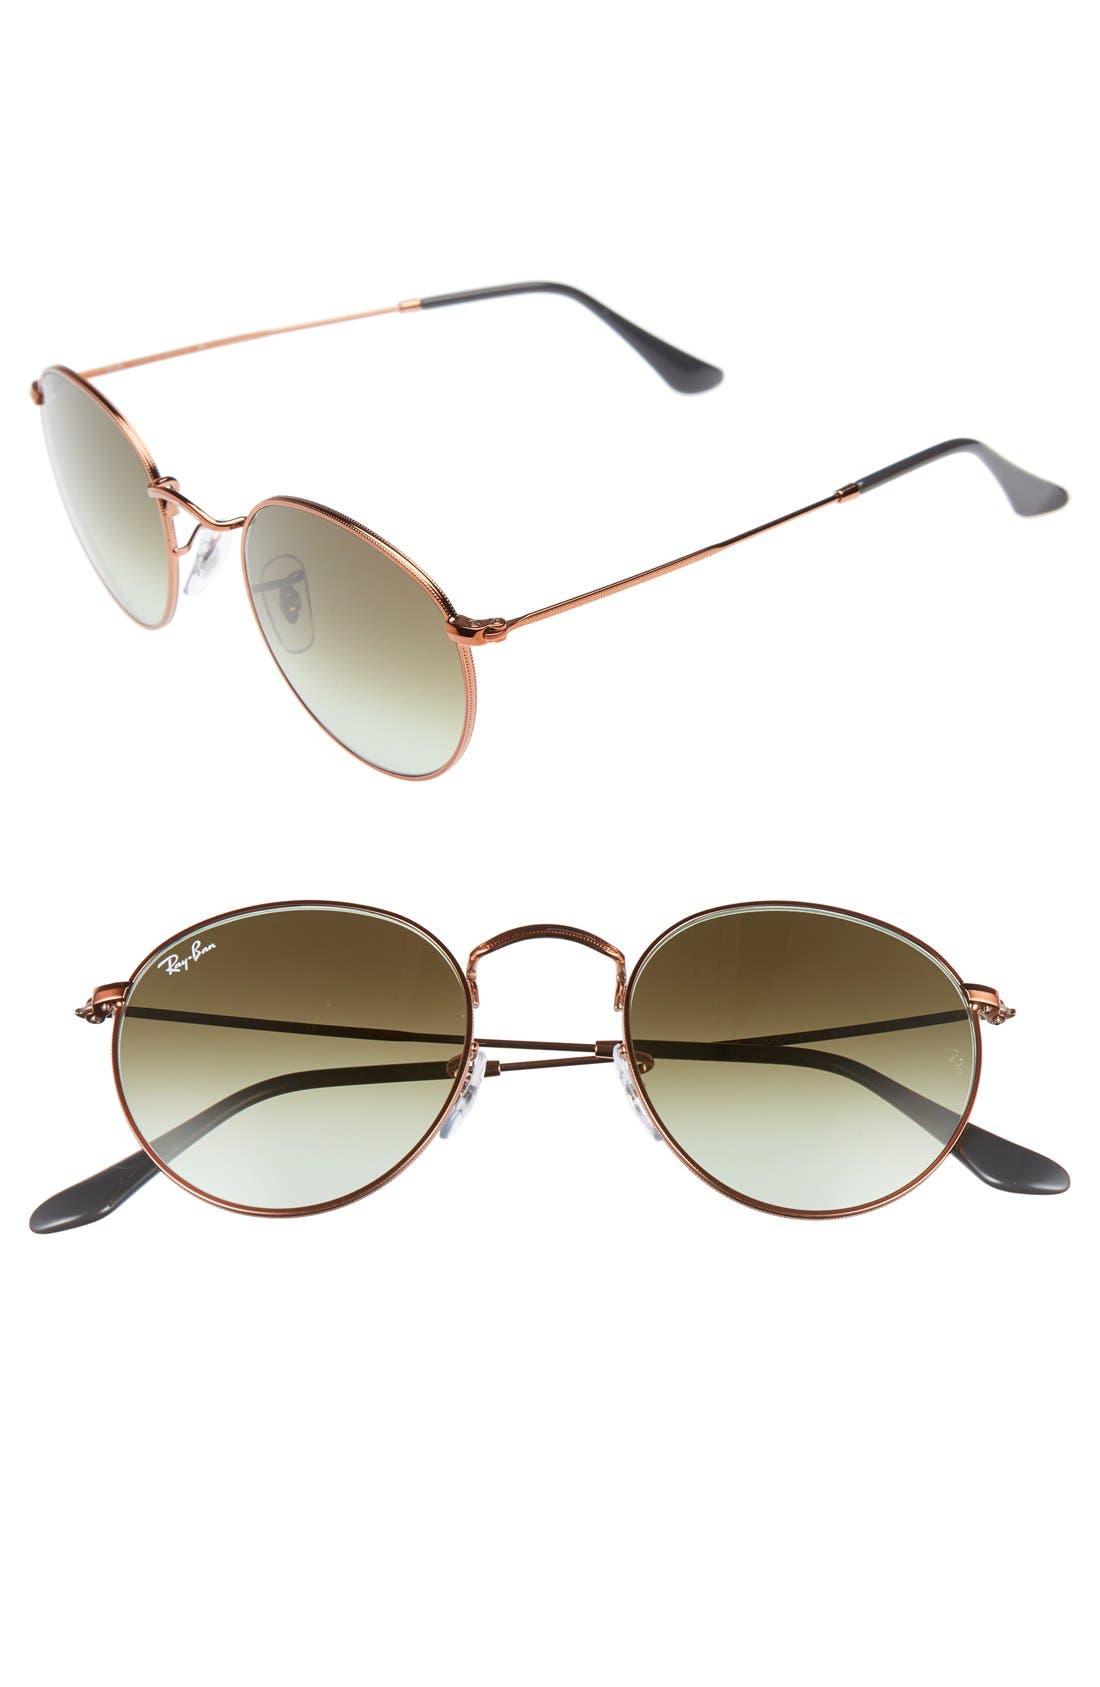 Icons 50mm Retro Sunglasses,                         Main,                         color,